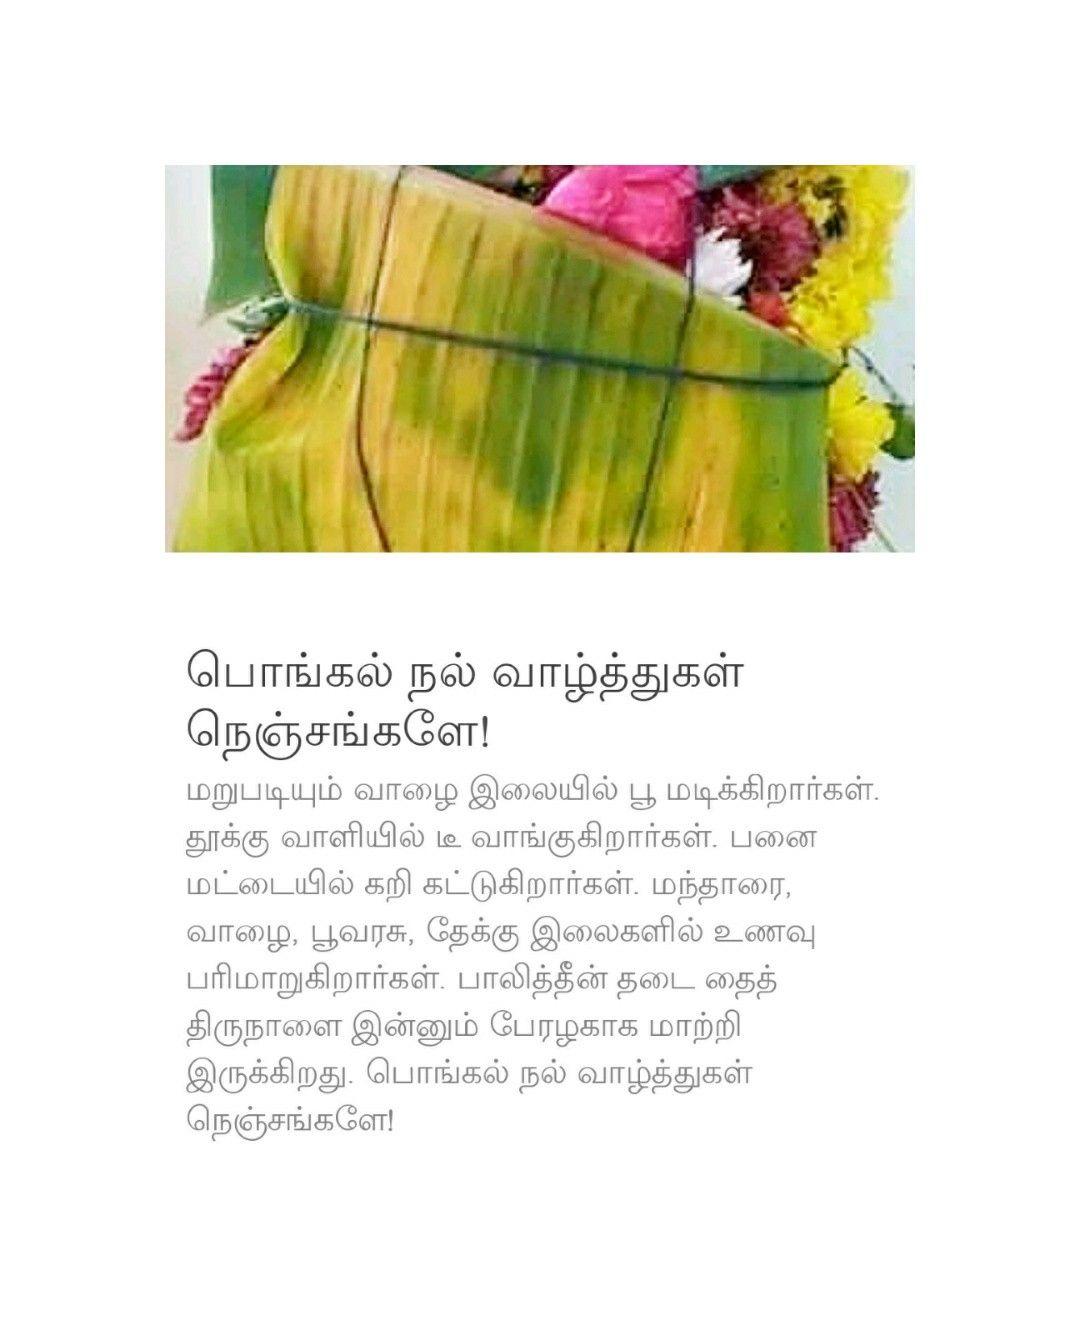 Pin by Vasu, Chittoor on Tamil, Vasu, Chittoor Asparagus